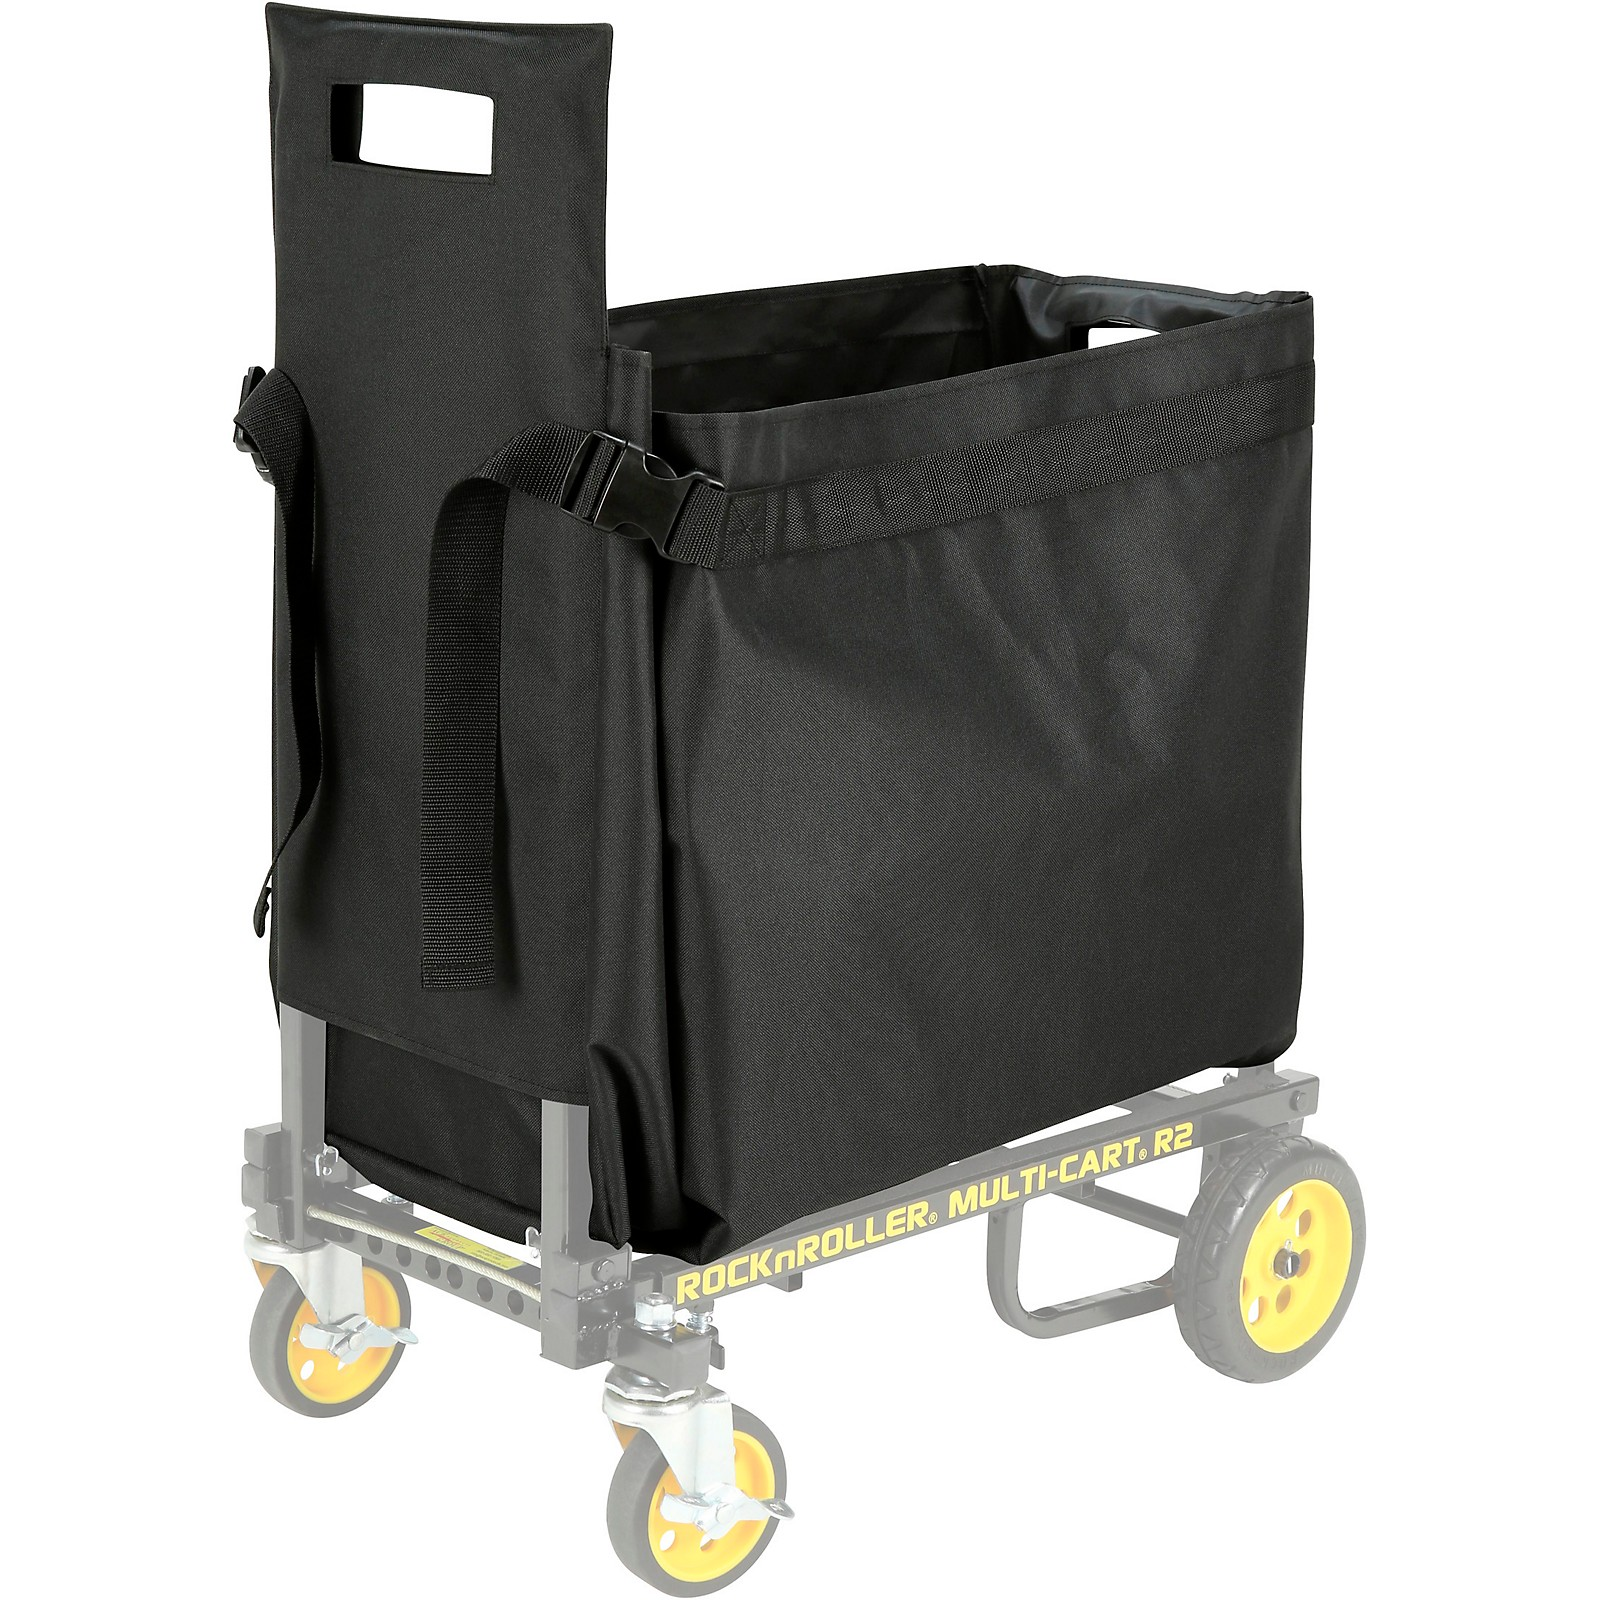 Rock N Roller RSA-WAG2 Wagon Bag For R2 Carts